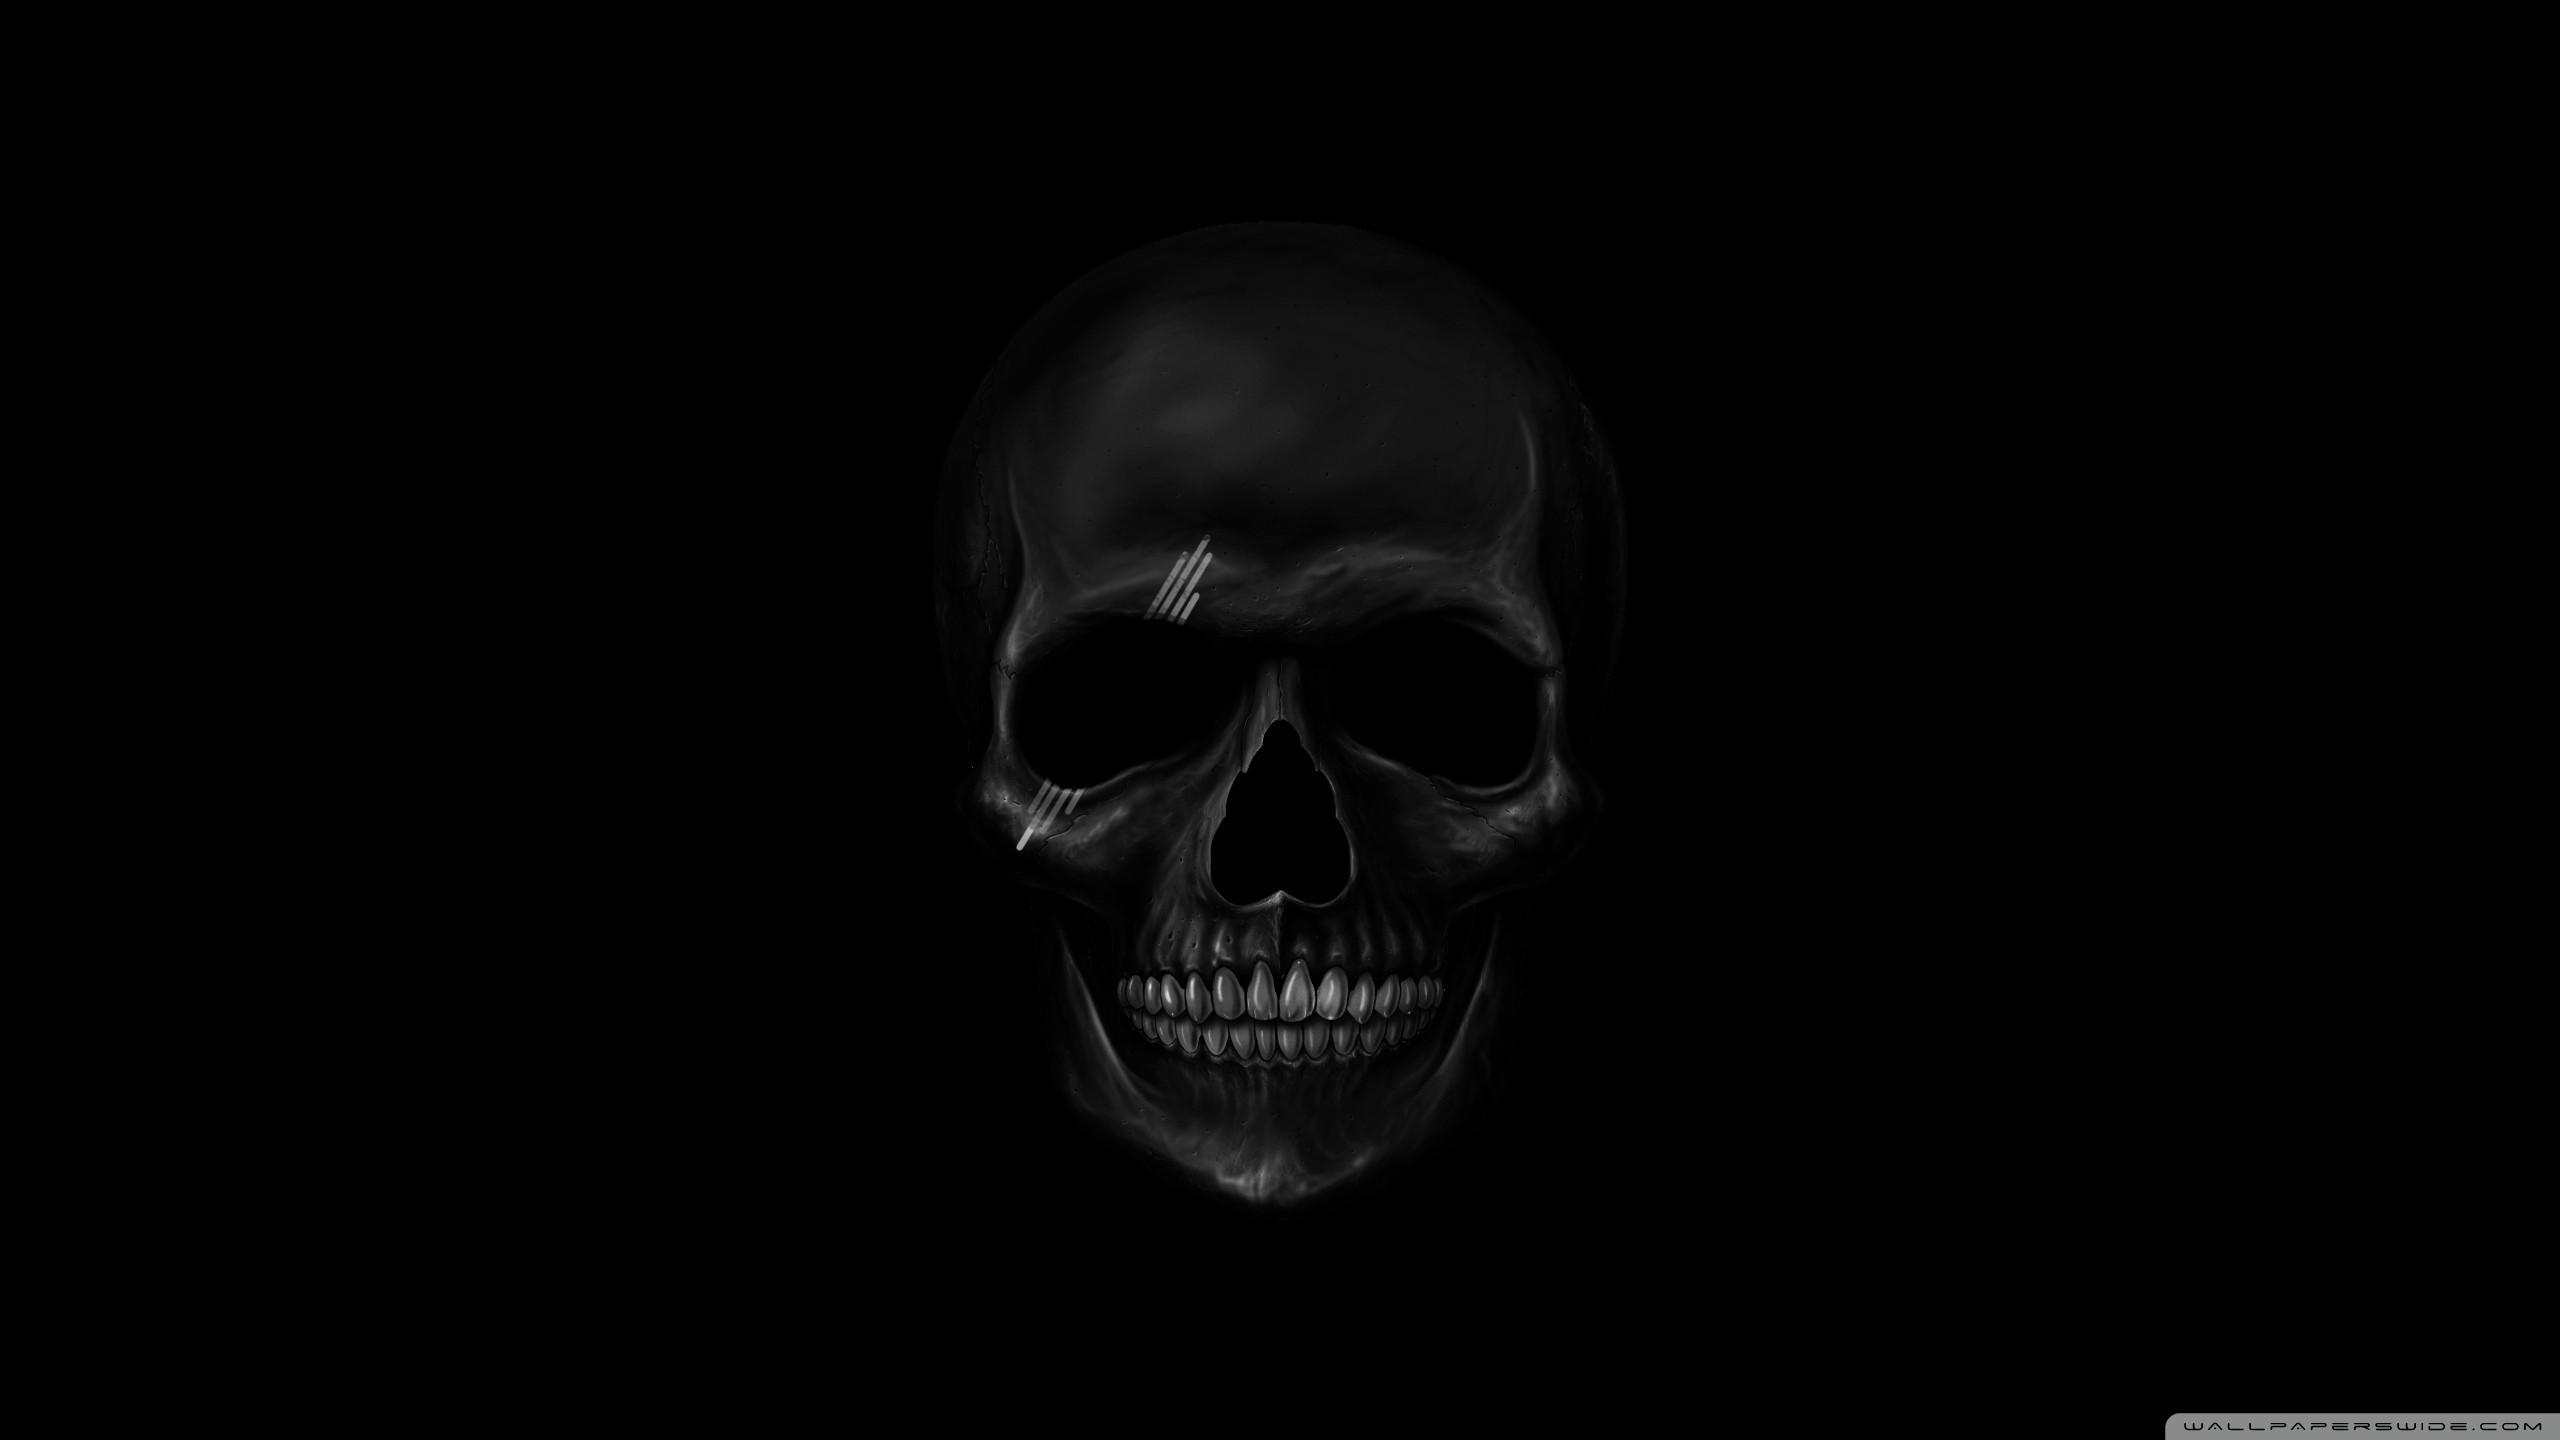 Skull Wallpapers For Desktop 48 Pictures